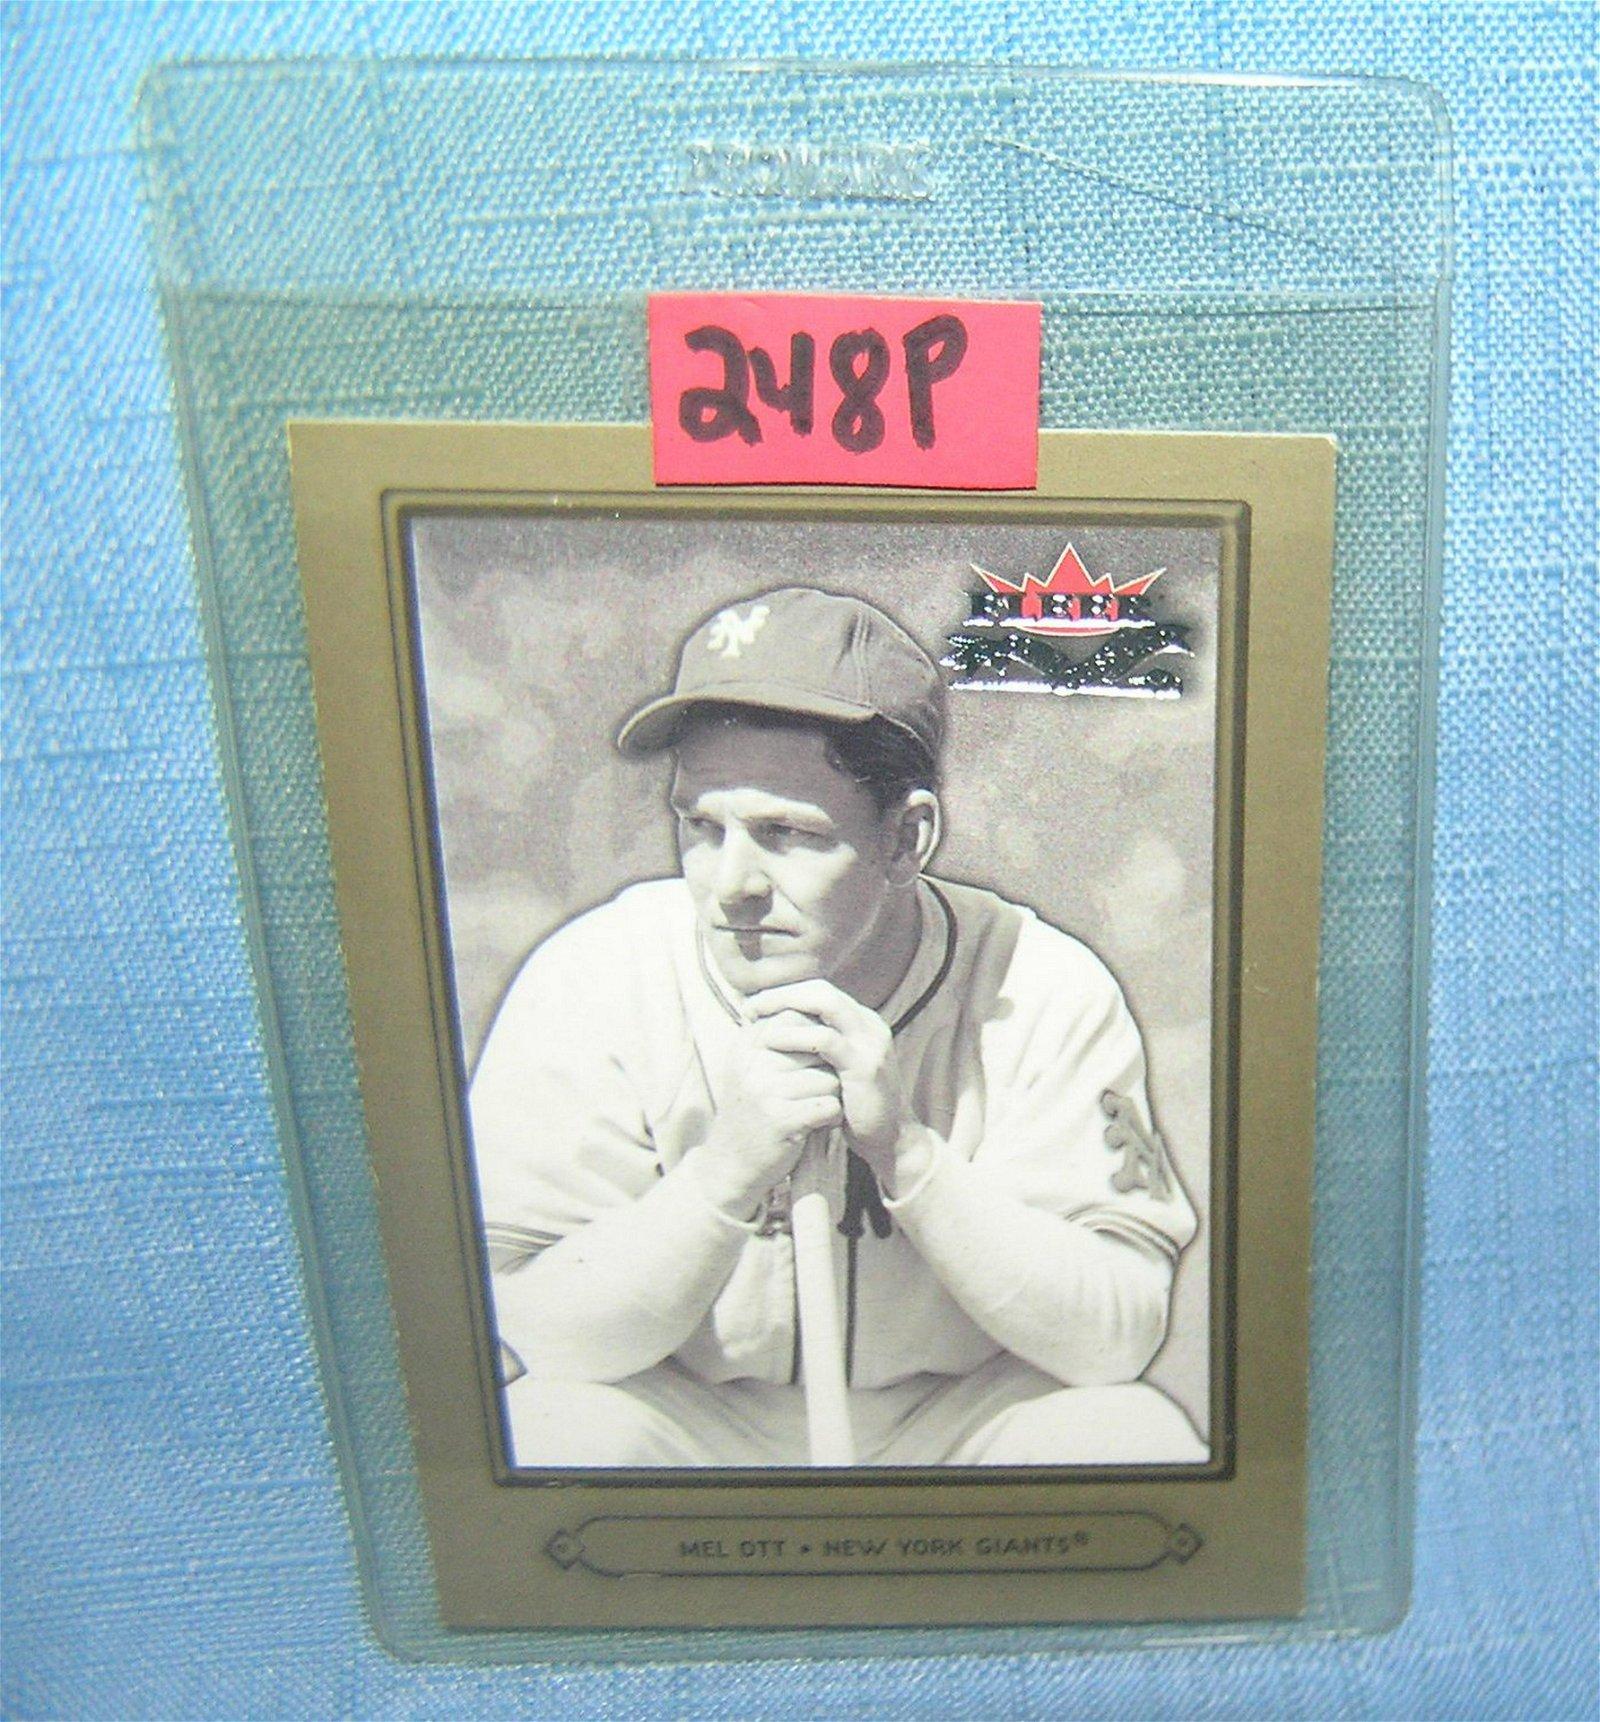 Mel Ott Retro Style Baseball Card Aug 11 2019 Bakers Antiques